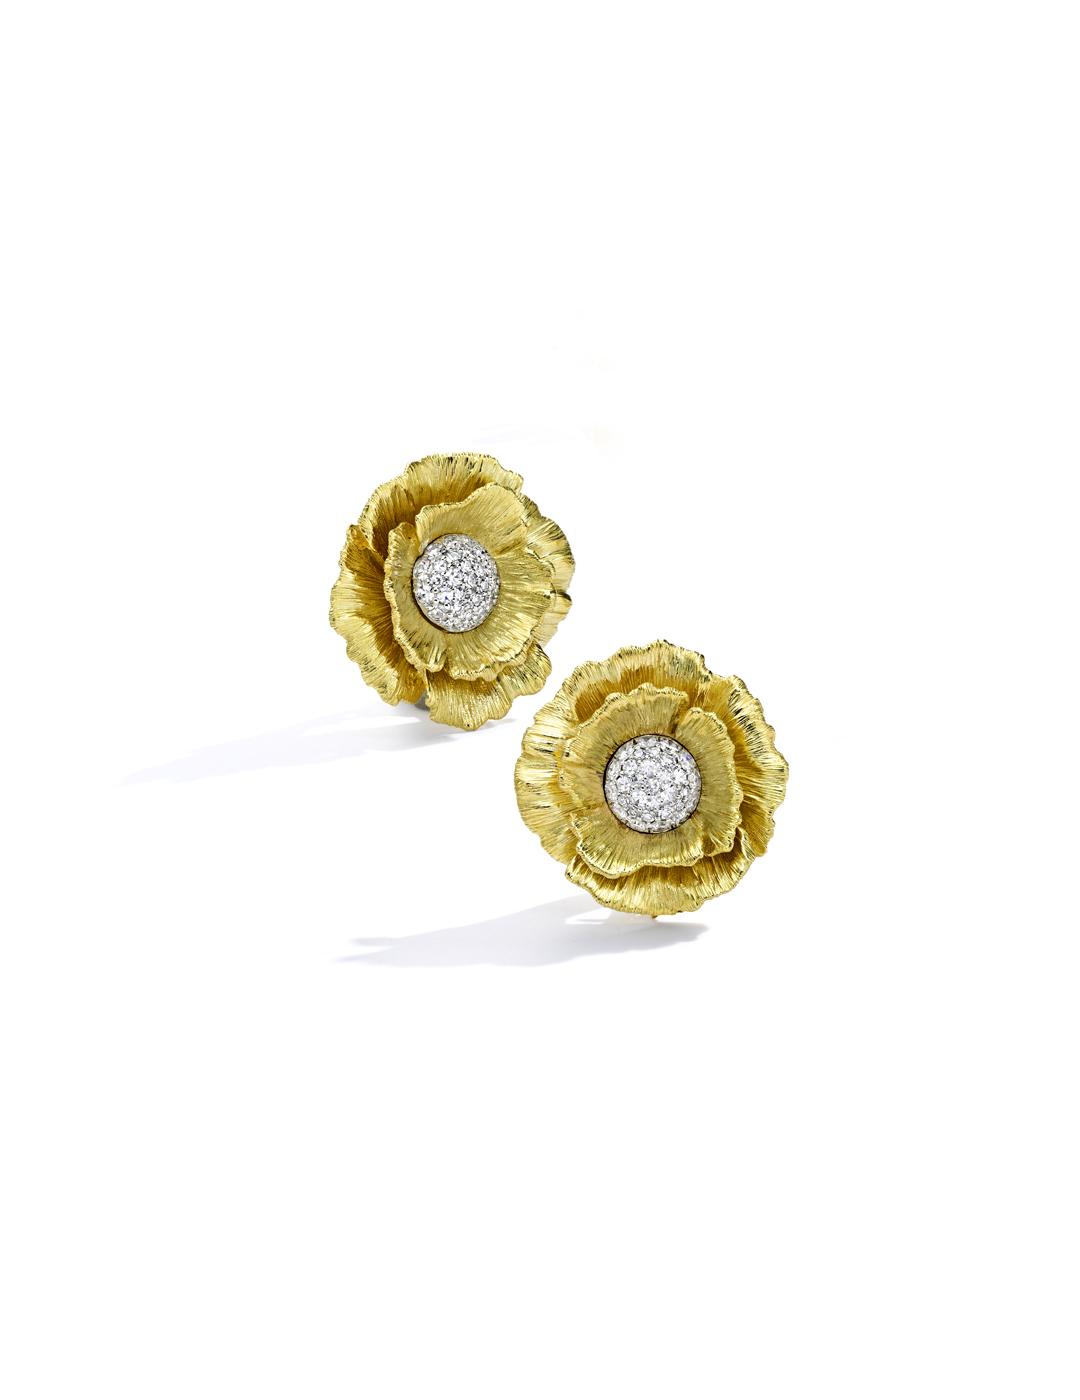 mish_products_earrings_Poppy EC-YG-ER-1